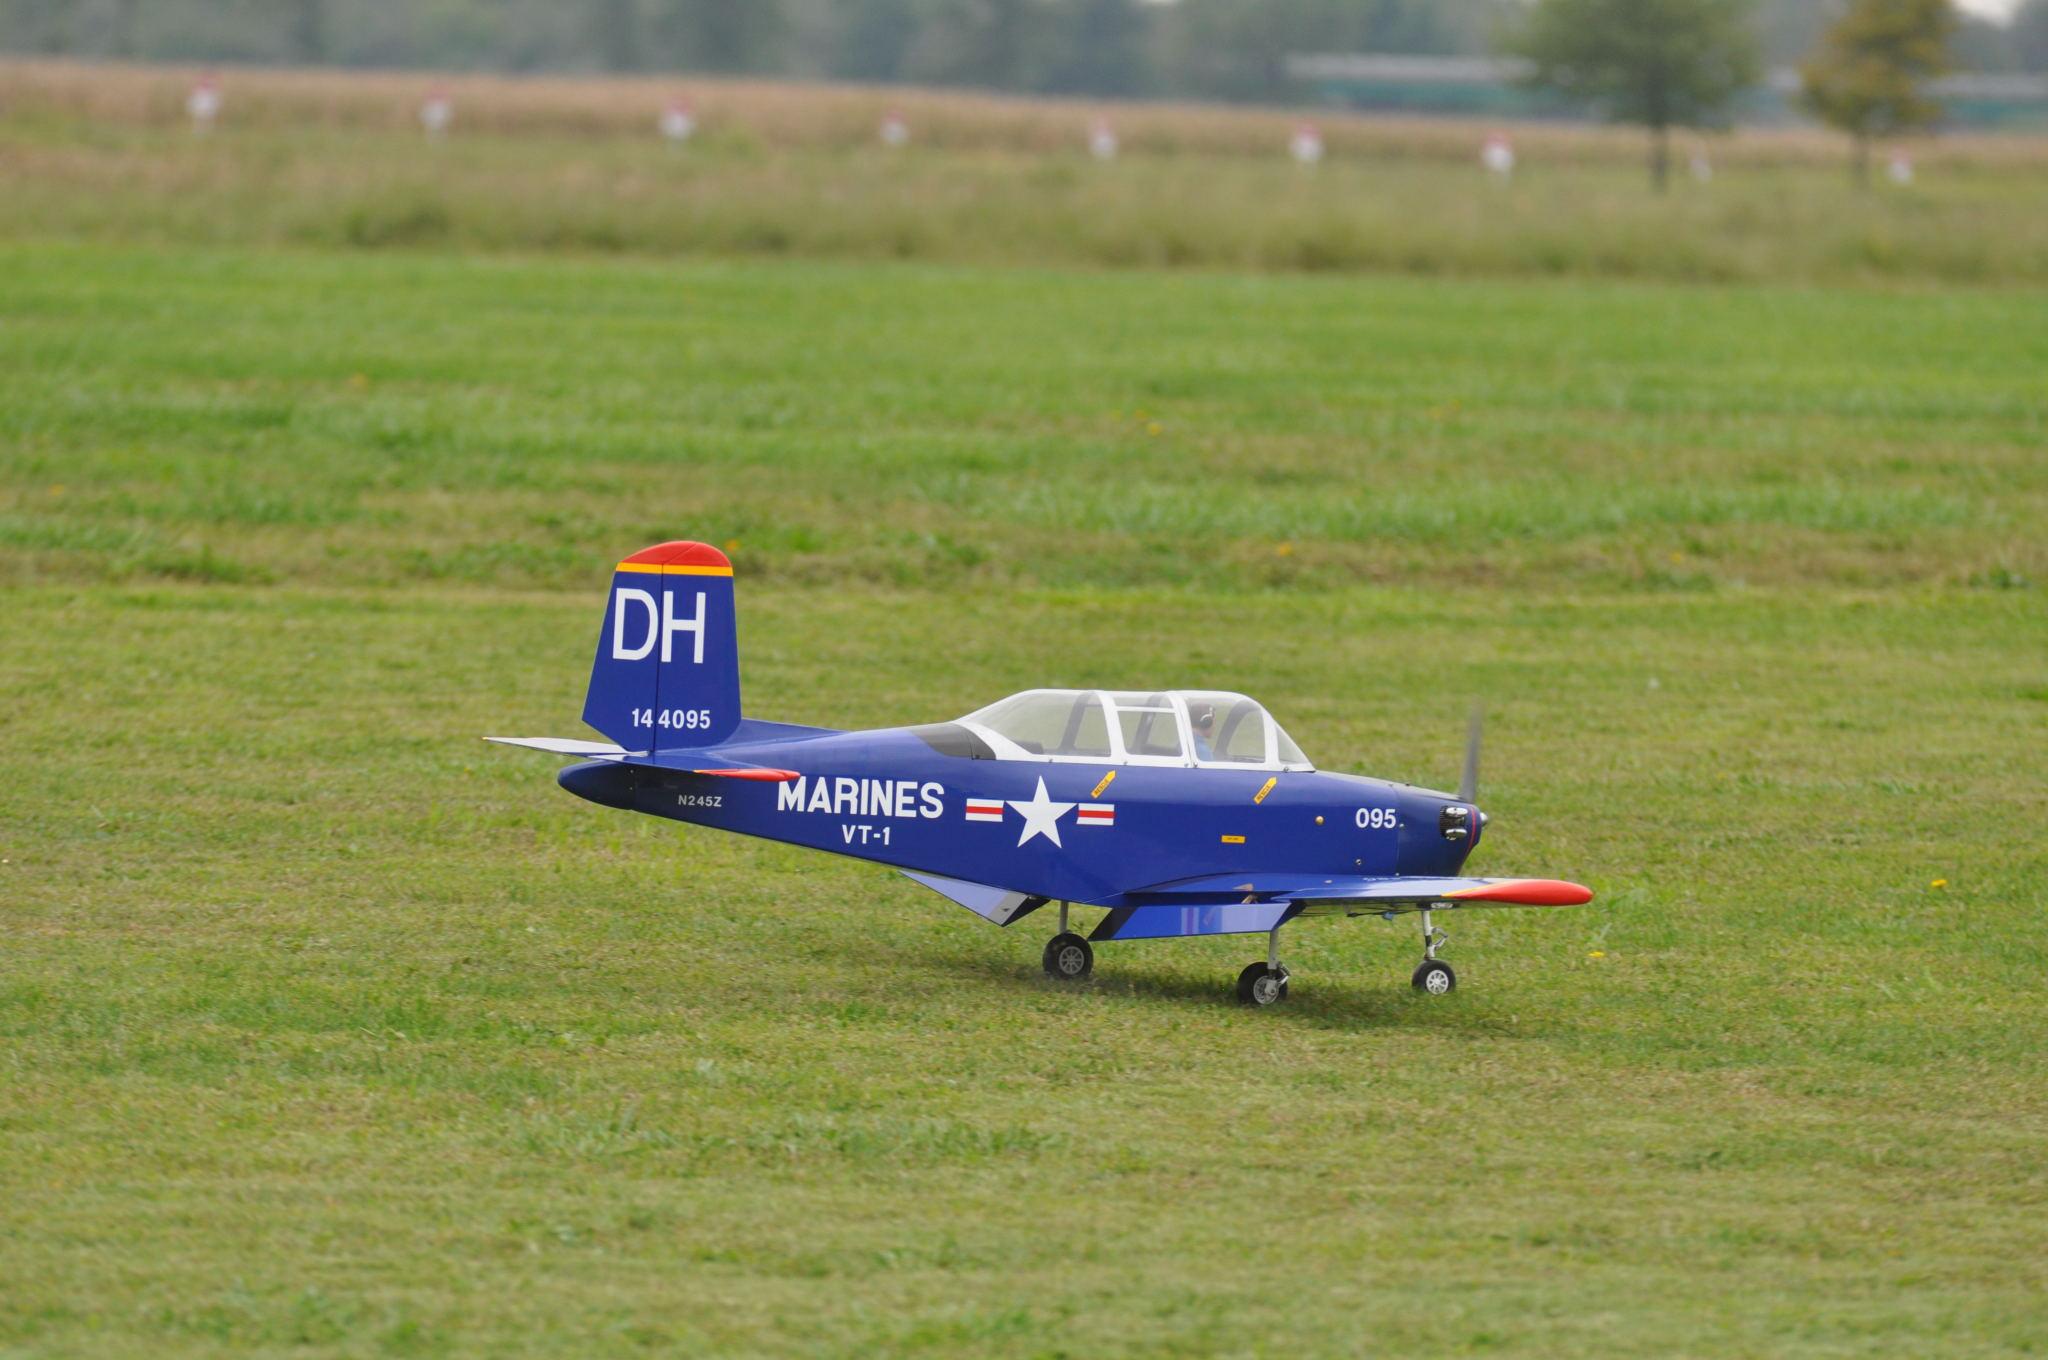 DSC_9355.JPG